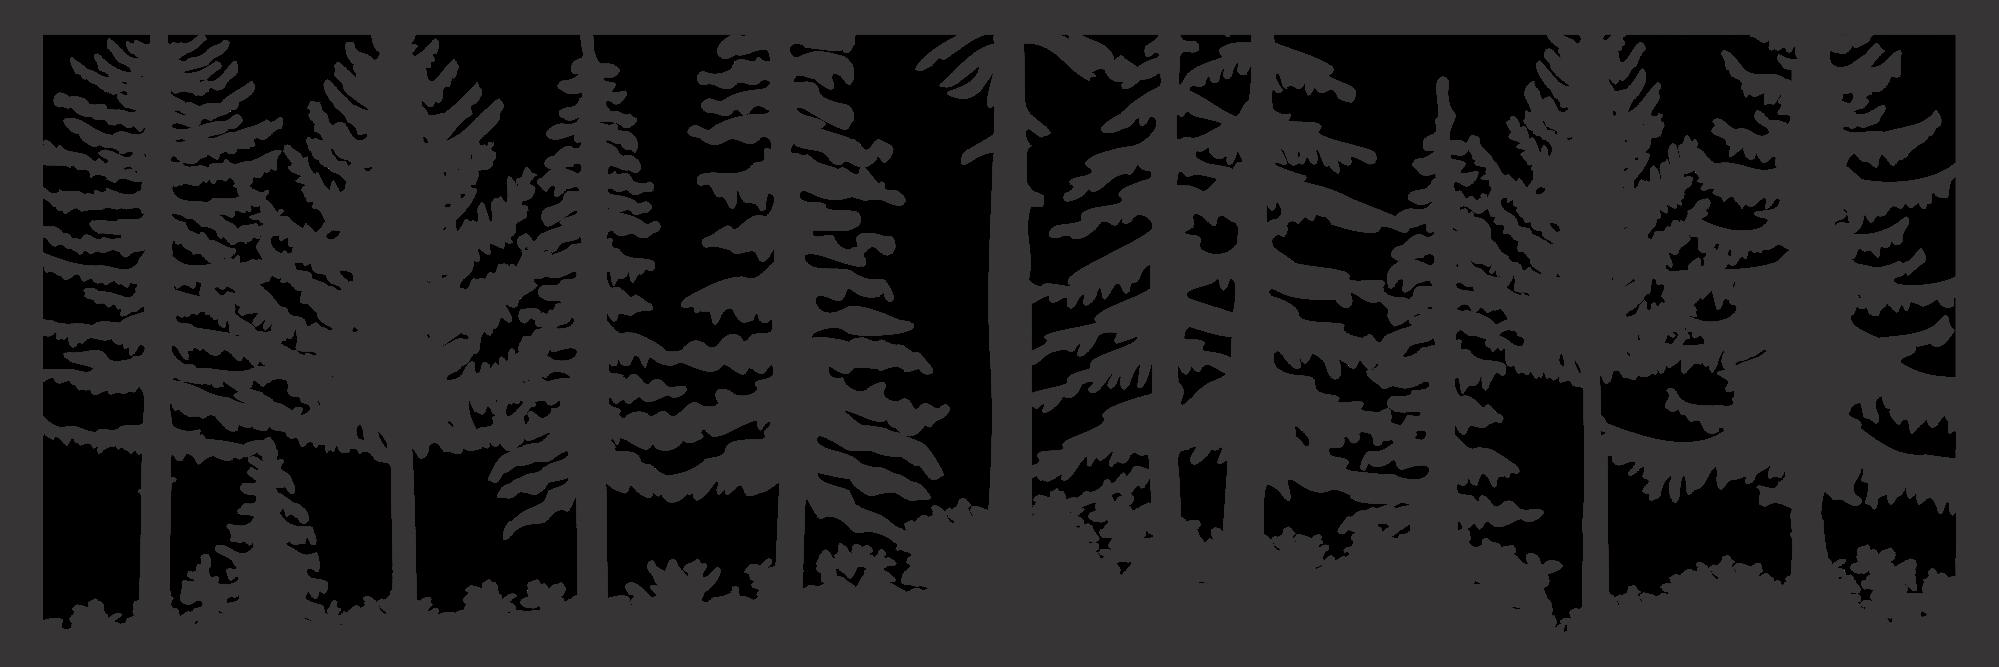 24 X 72 Just Trees Rick Plasma Art DXF File